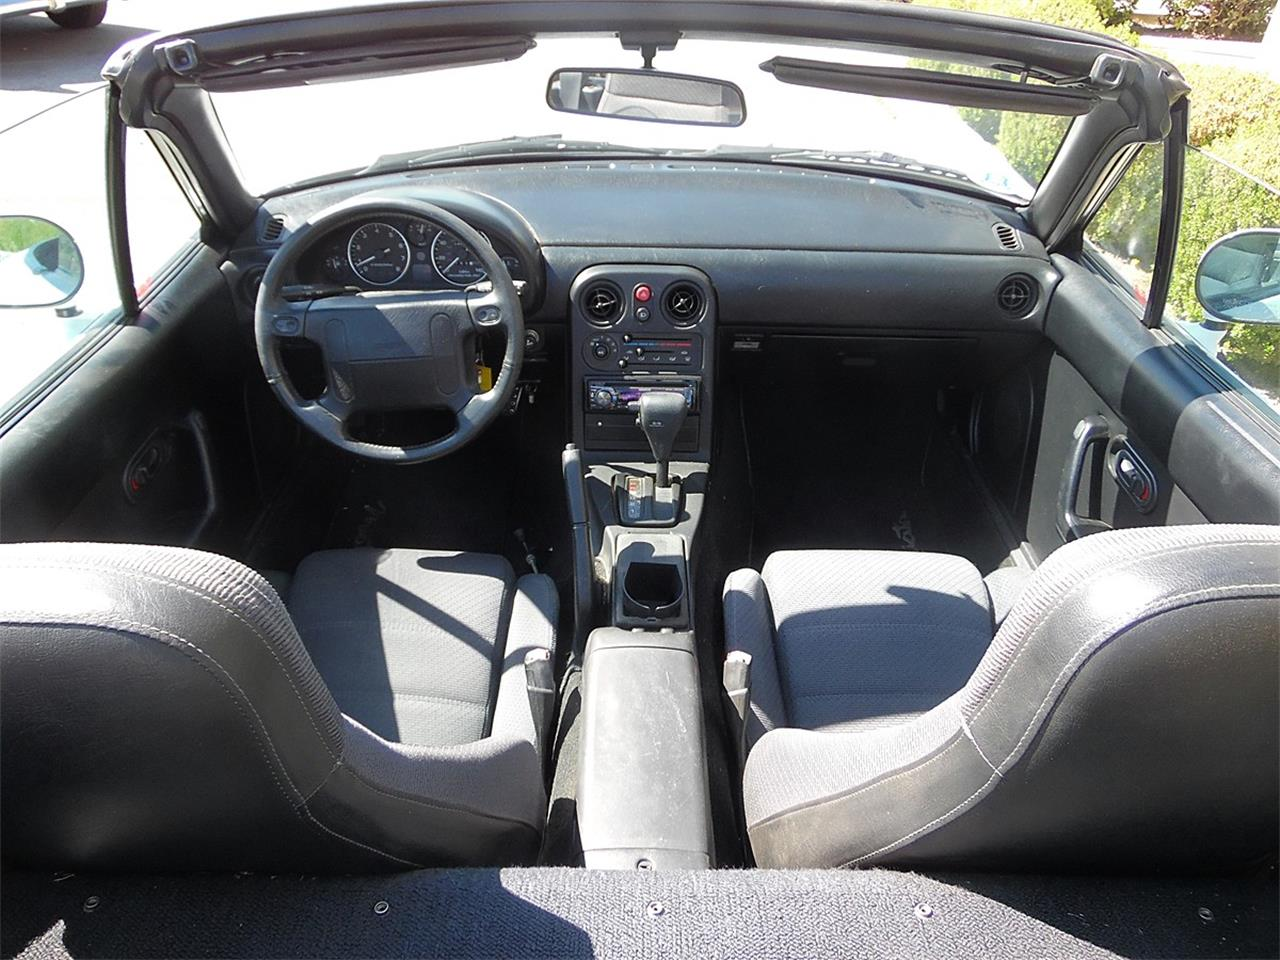 Large Picture of 1990 Mazda Miata - $9,995.00 - PVWW